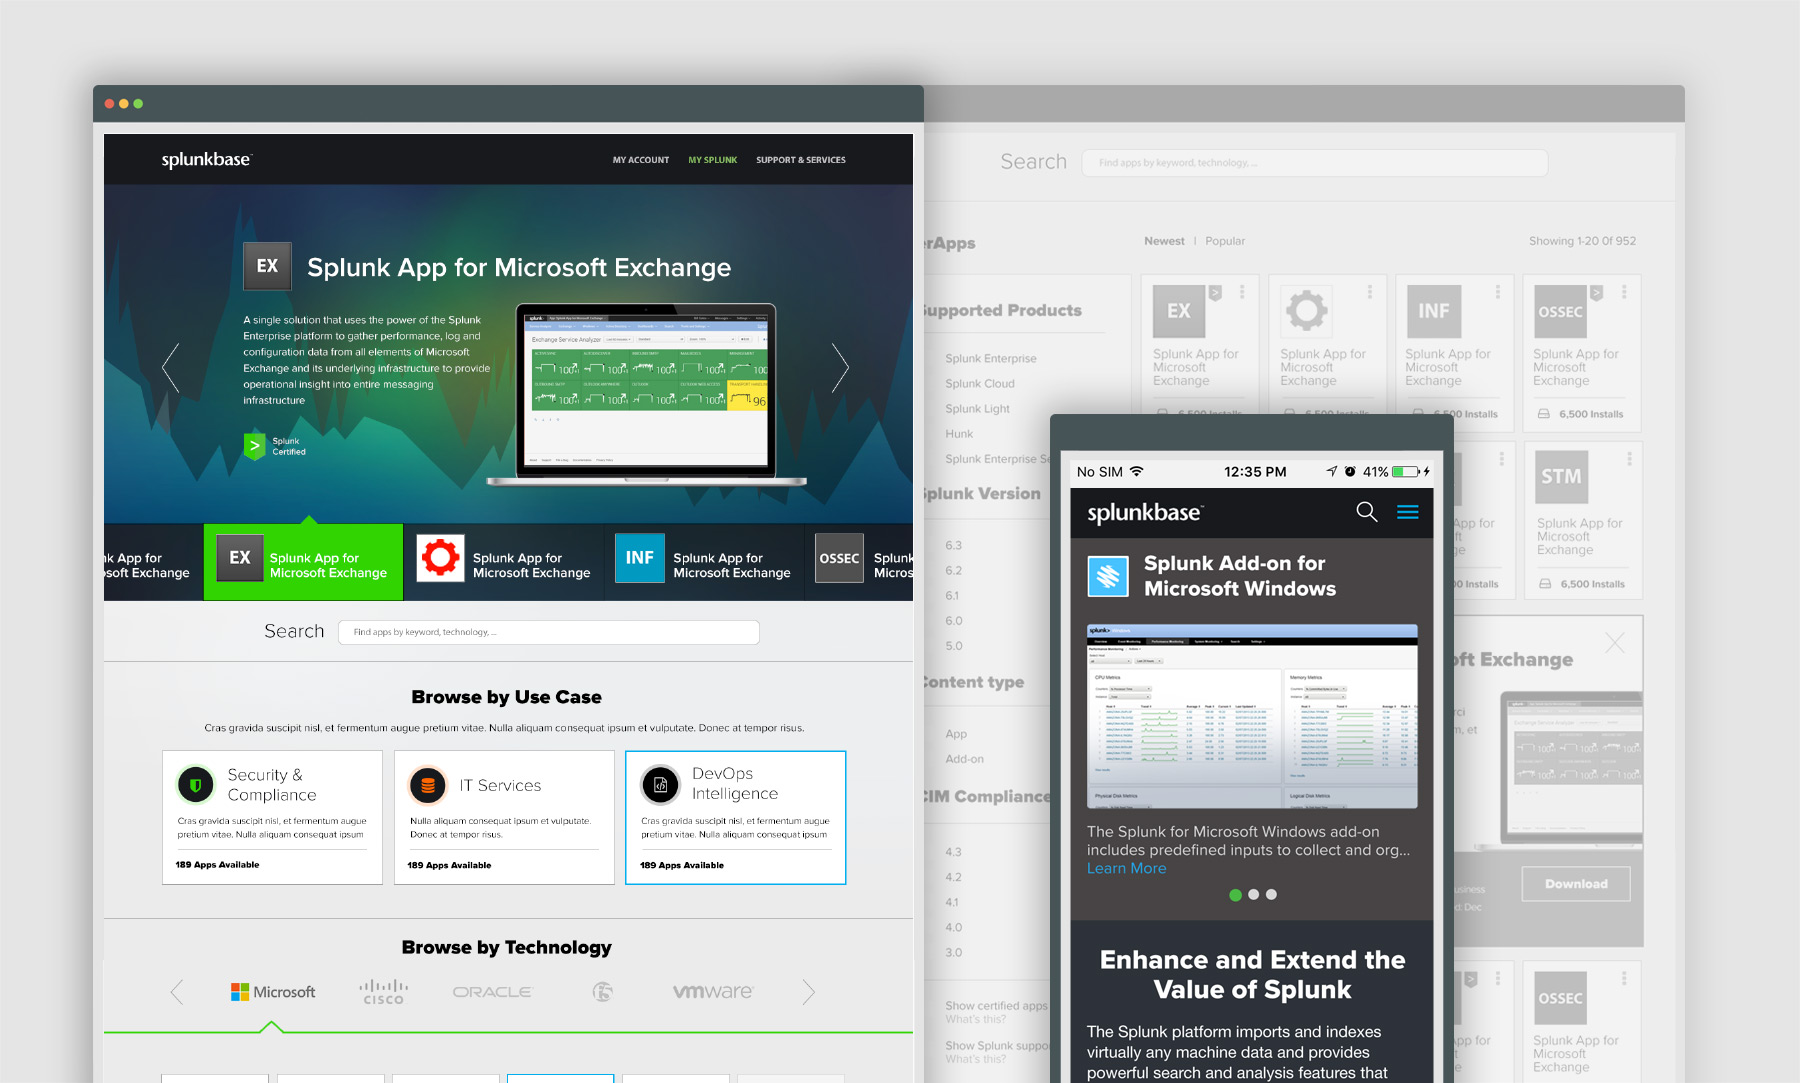 SplunkBase UX-UI Design